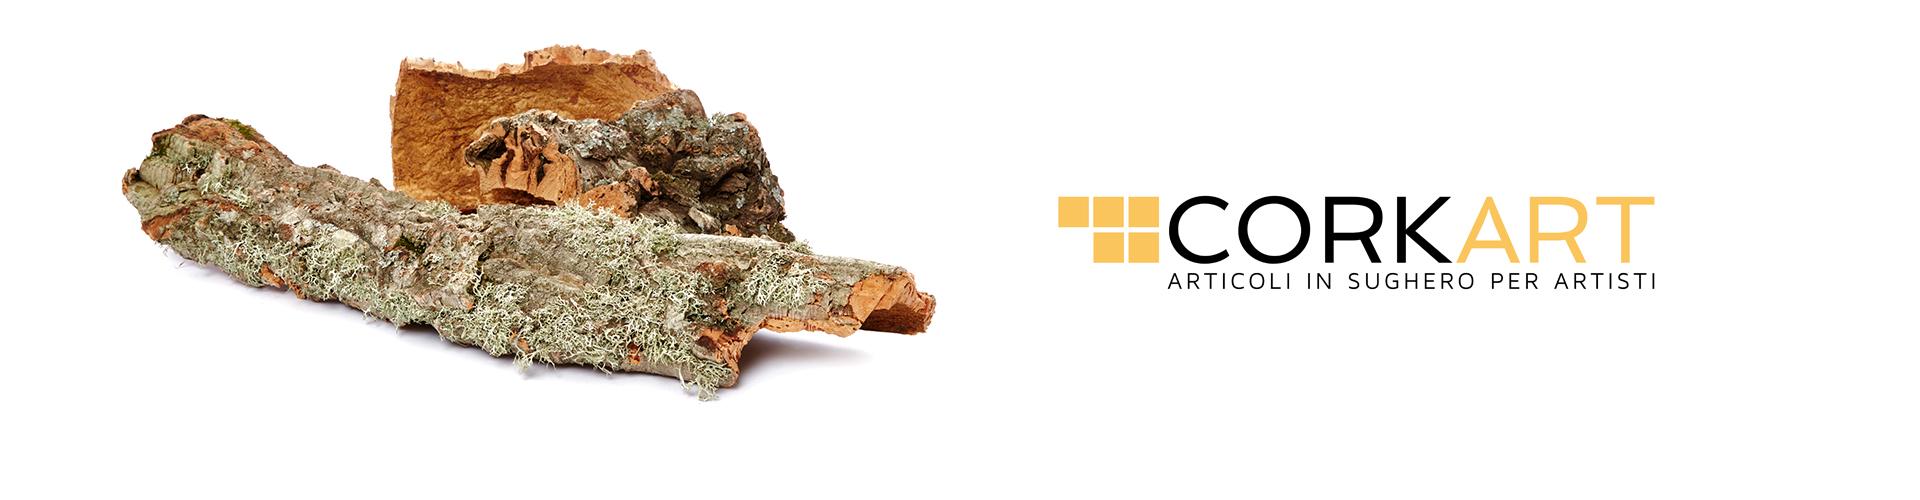 CorkArt 01